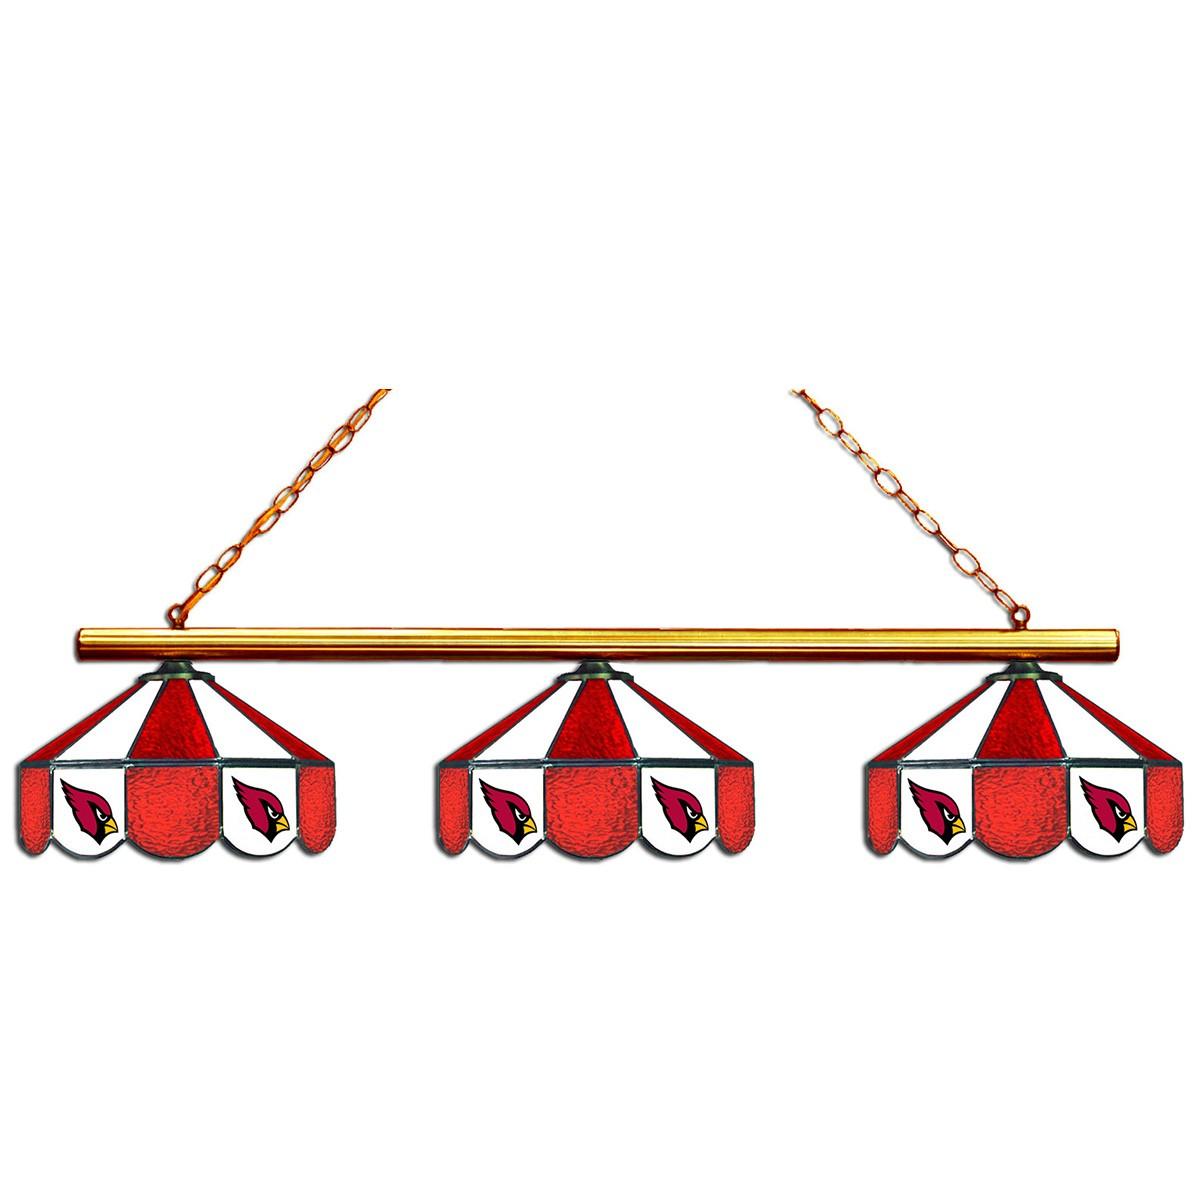 ARIZONA CARDINALS 3 SHADE GLASS LAMP